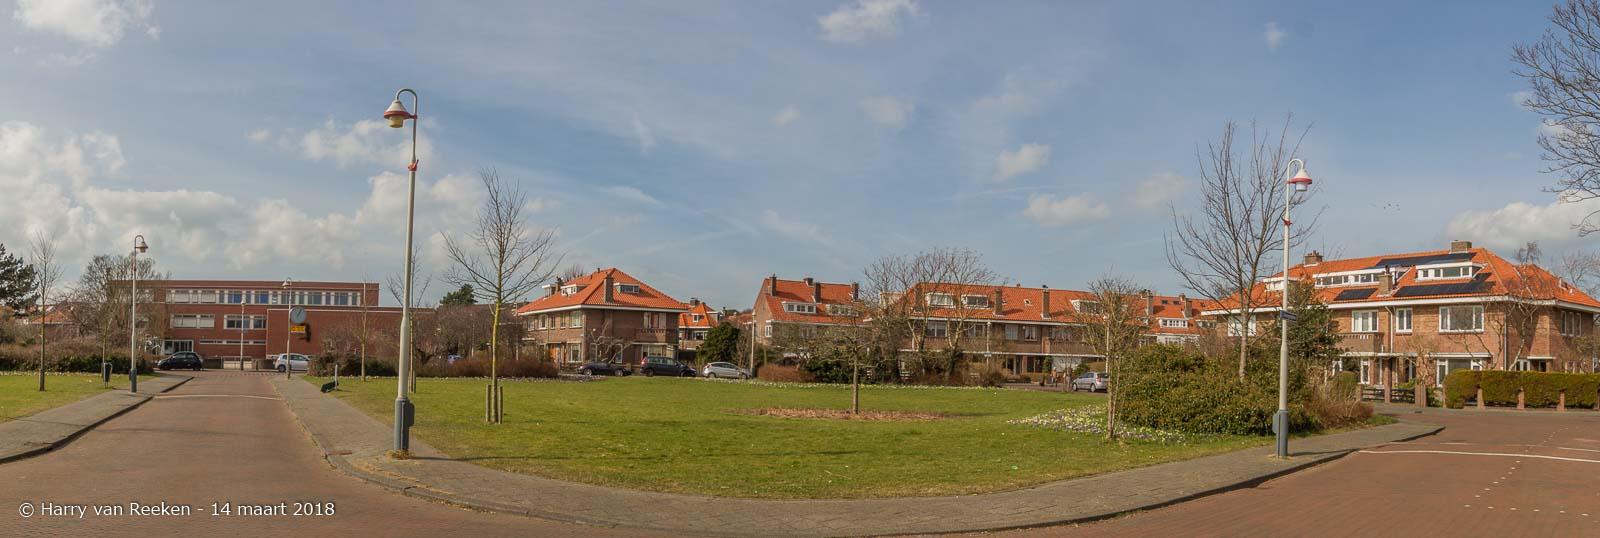 IJsvogelplein-wk13-22-Pano